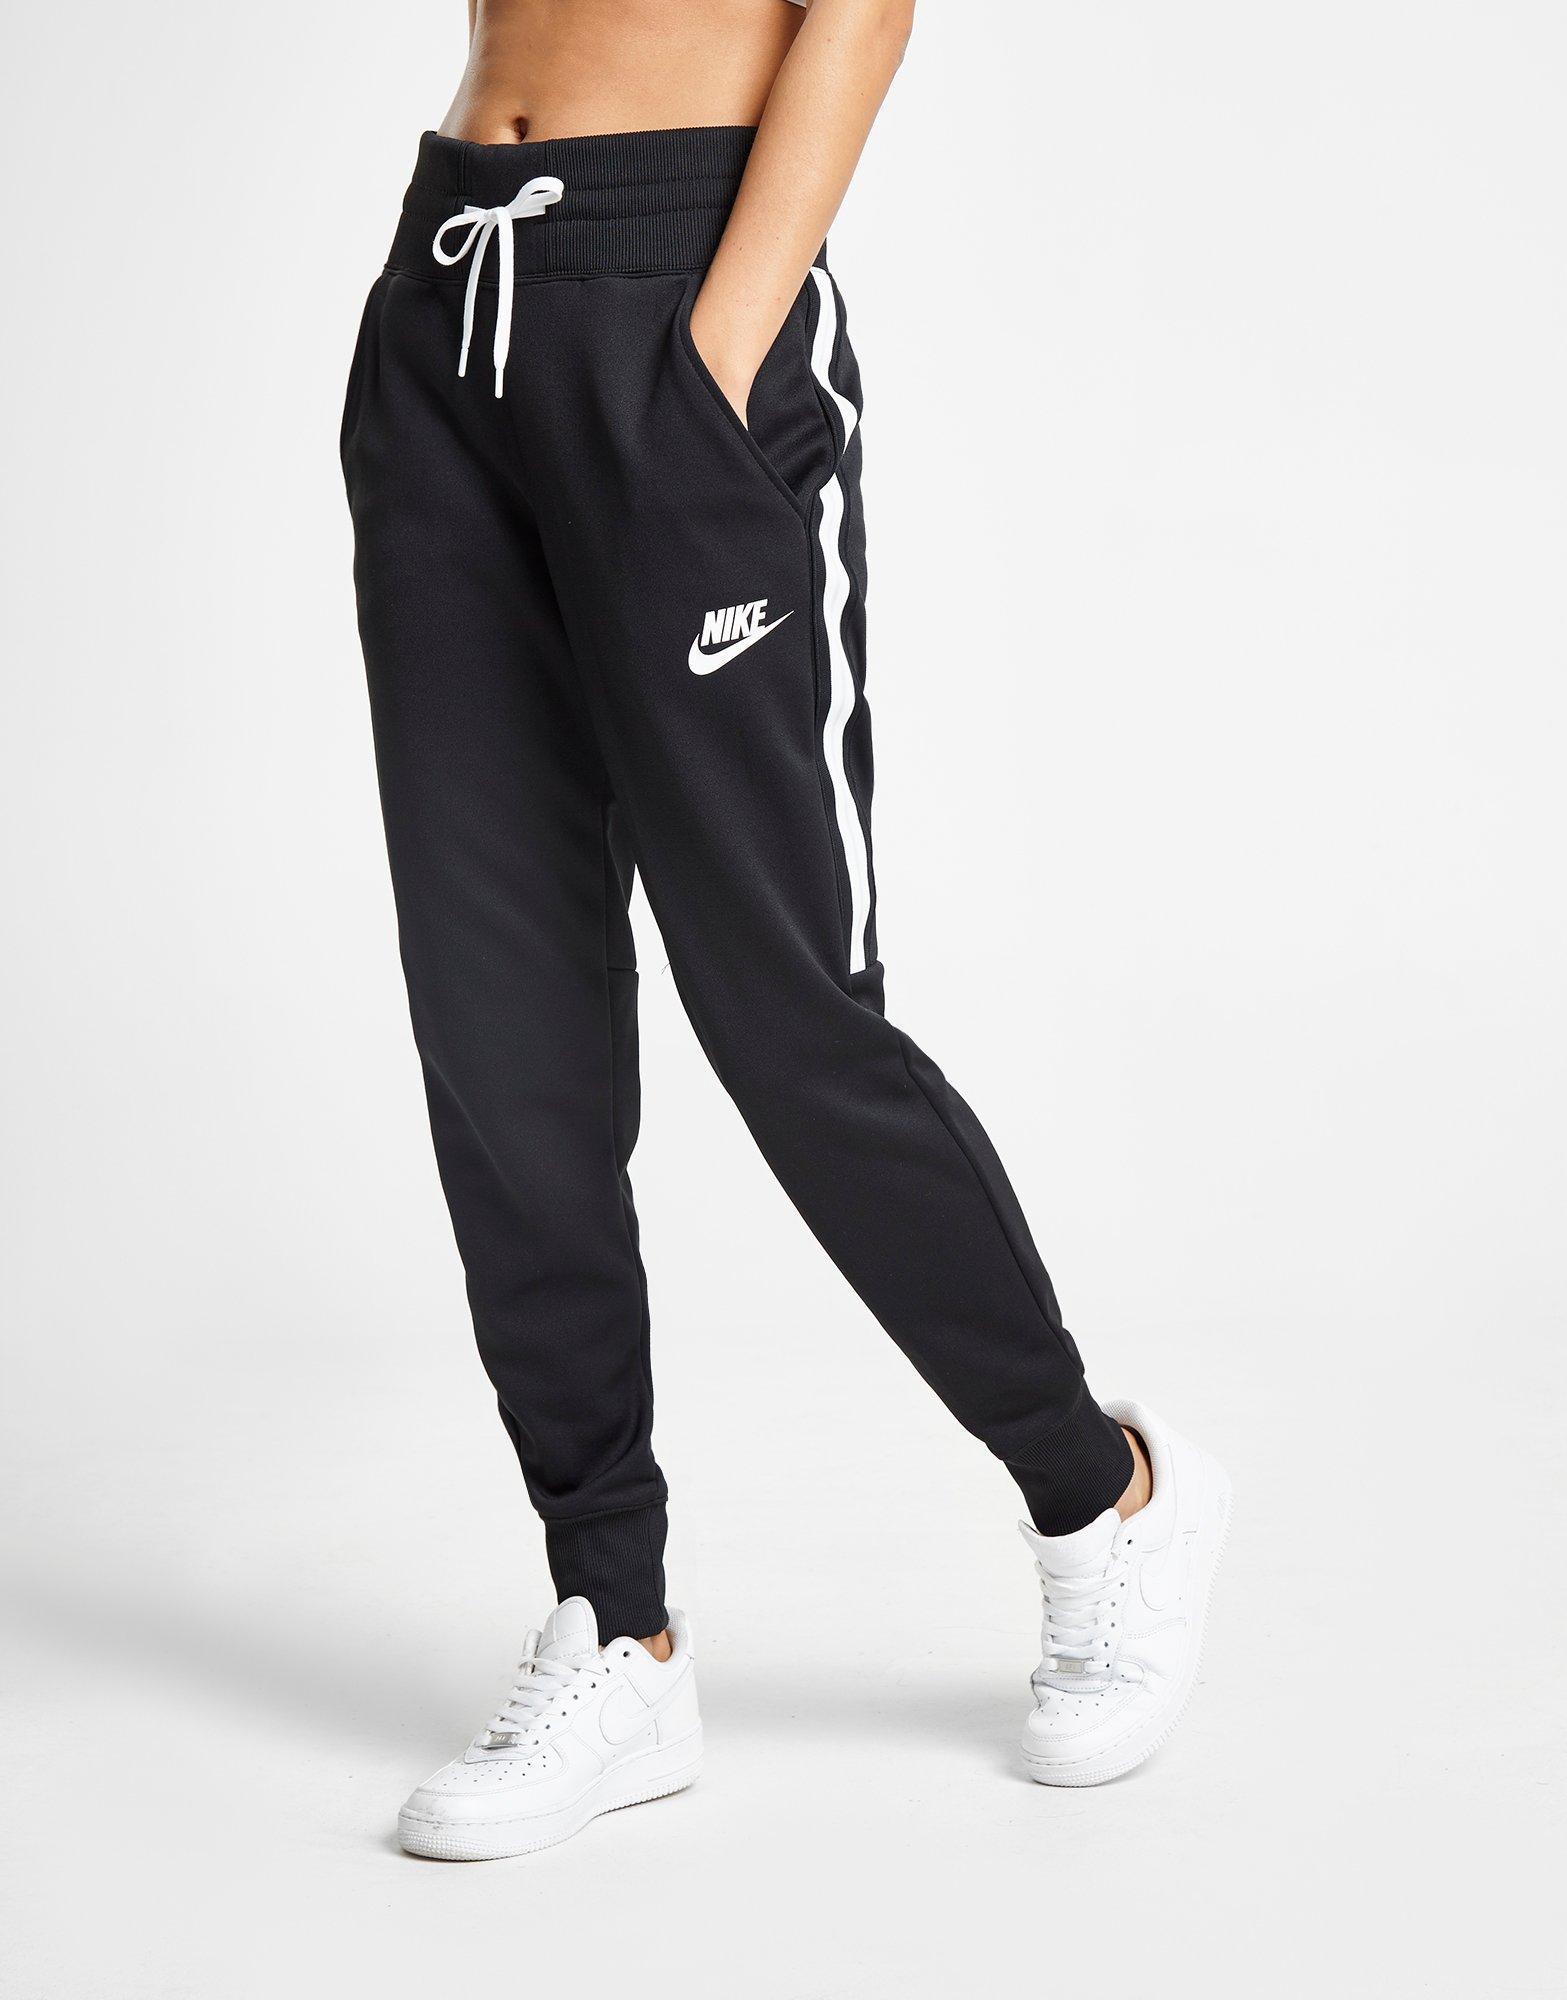 b7eff9cae66b Nike Poly Stripe Track Pants in Black - Lyst